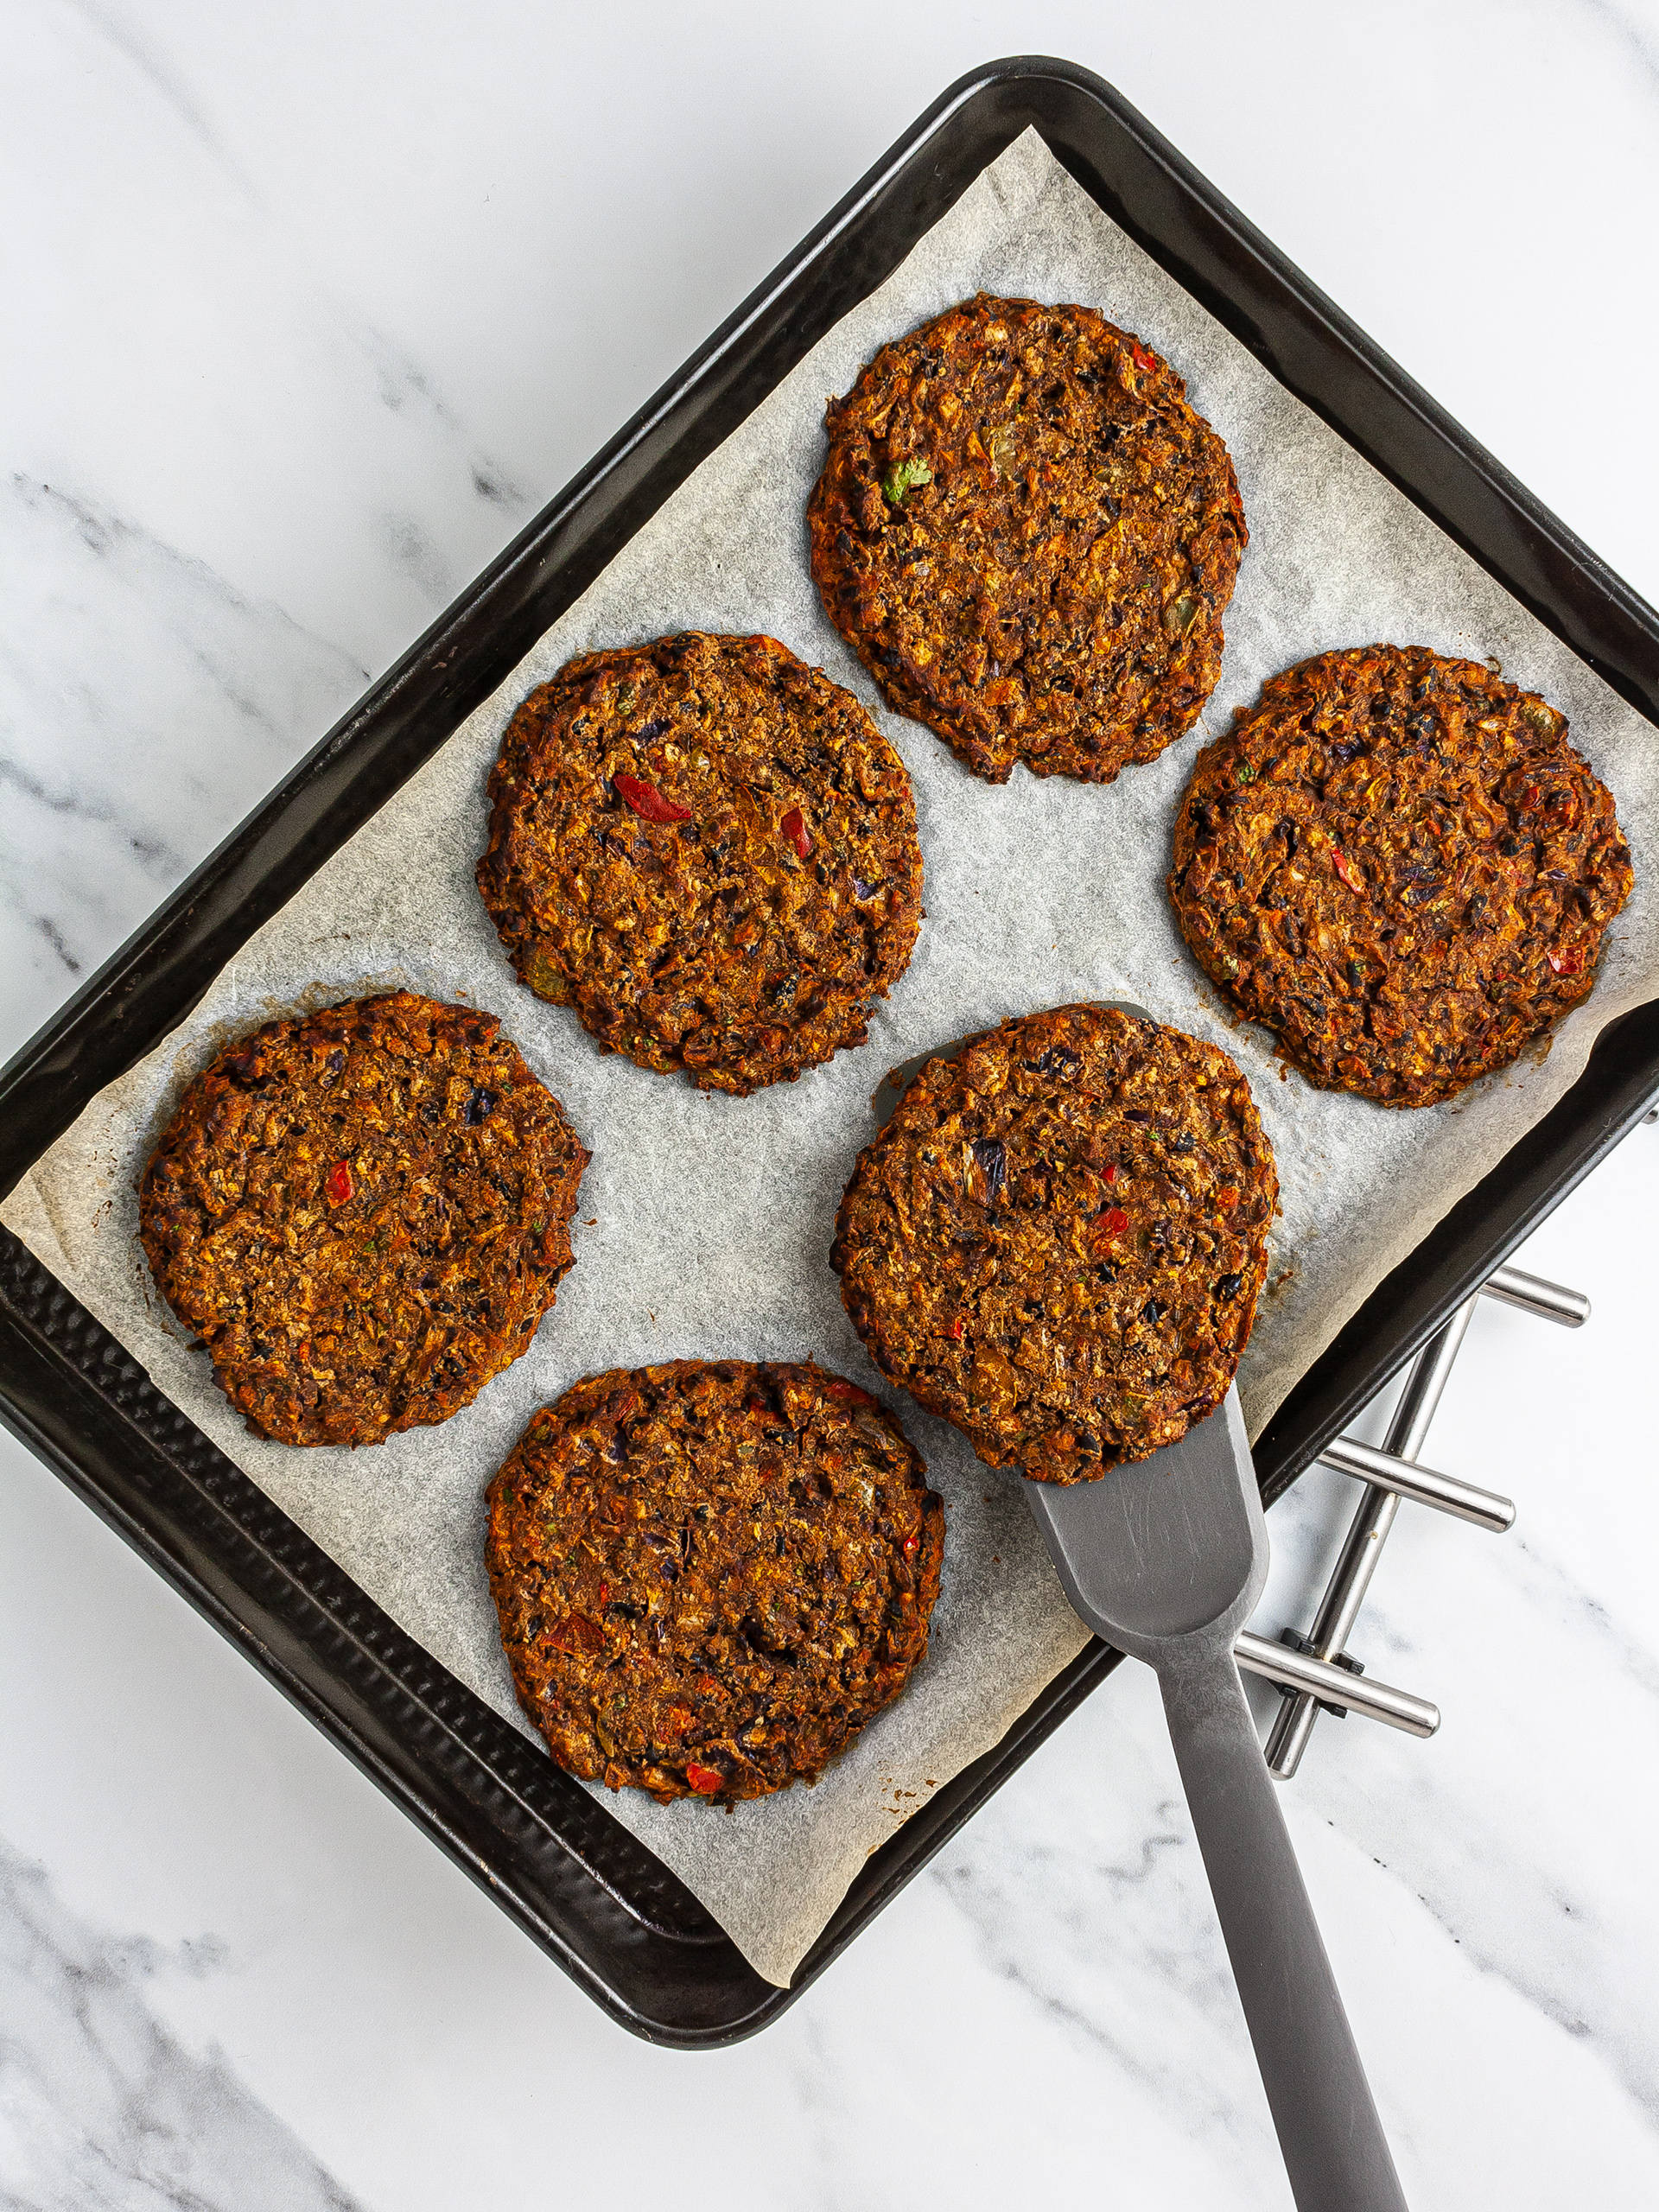 Oven-baked black bean fritters